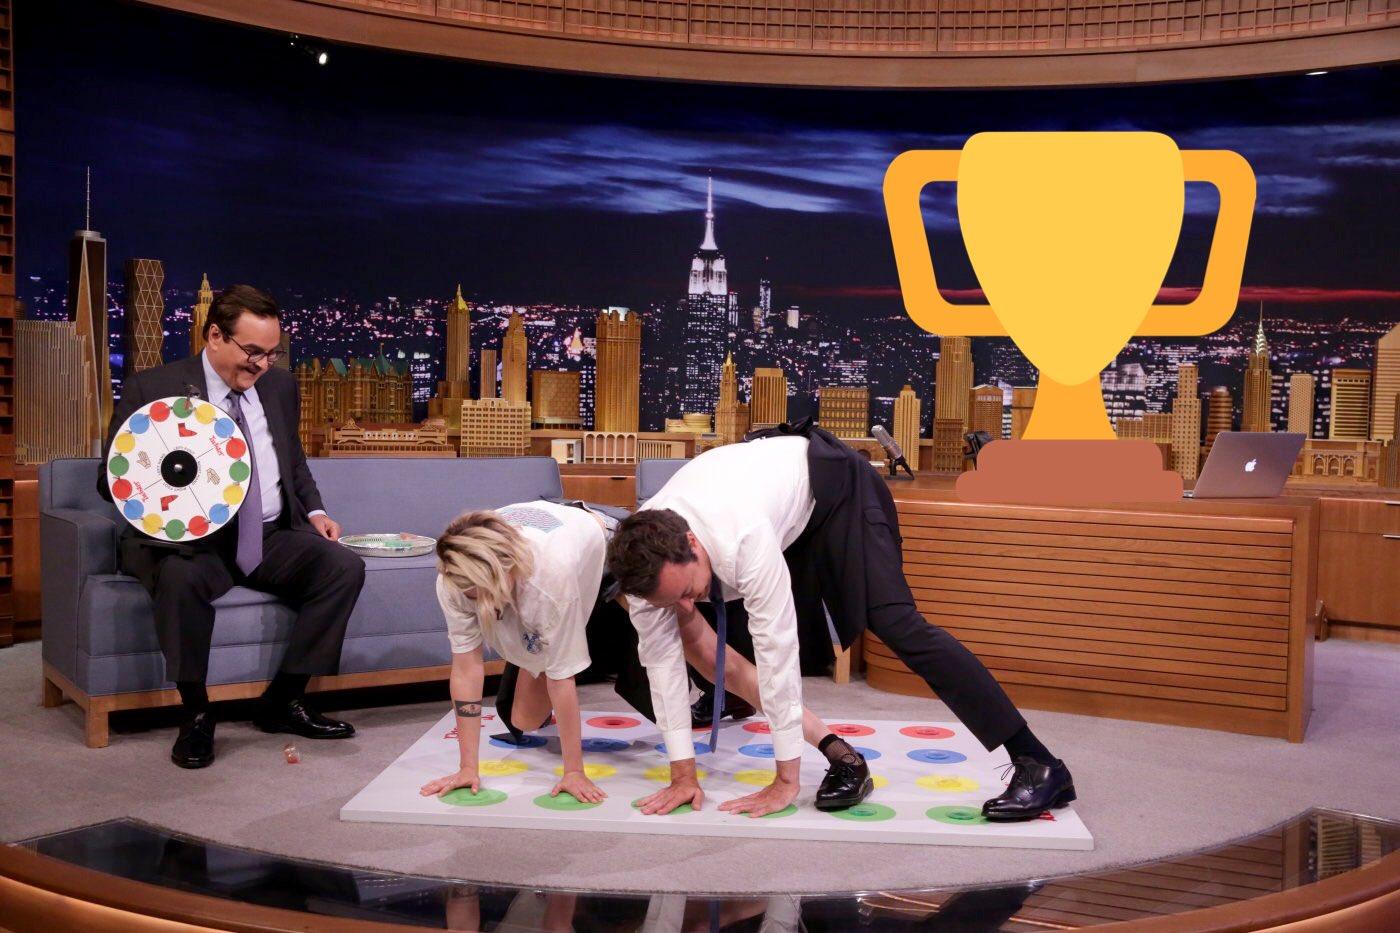 Jell-o Twister #FallonTonight https://t.co/9uCvnMopAO